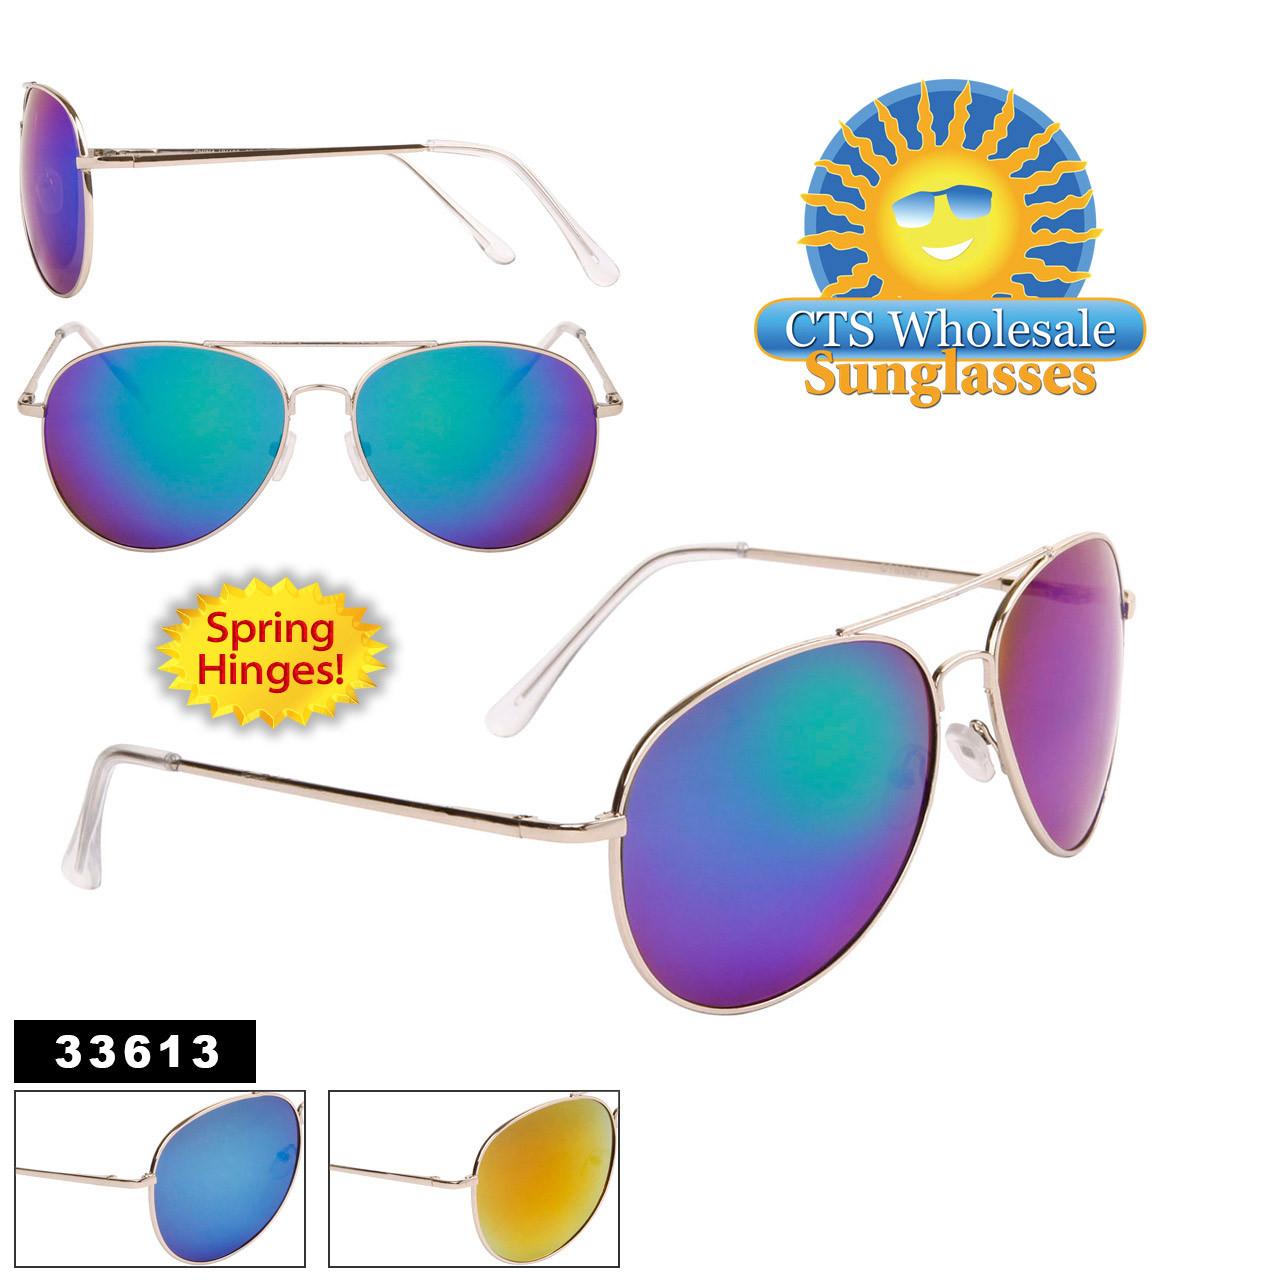 Flash Mirror Aviators with Spring Hinge - Style #33613